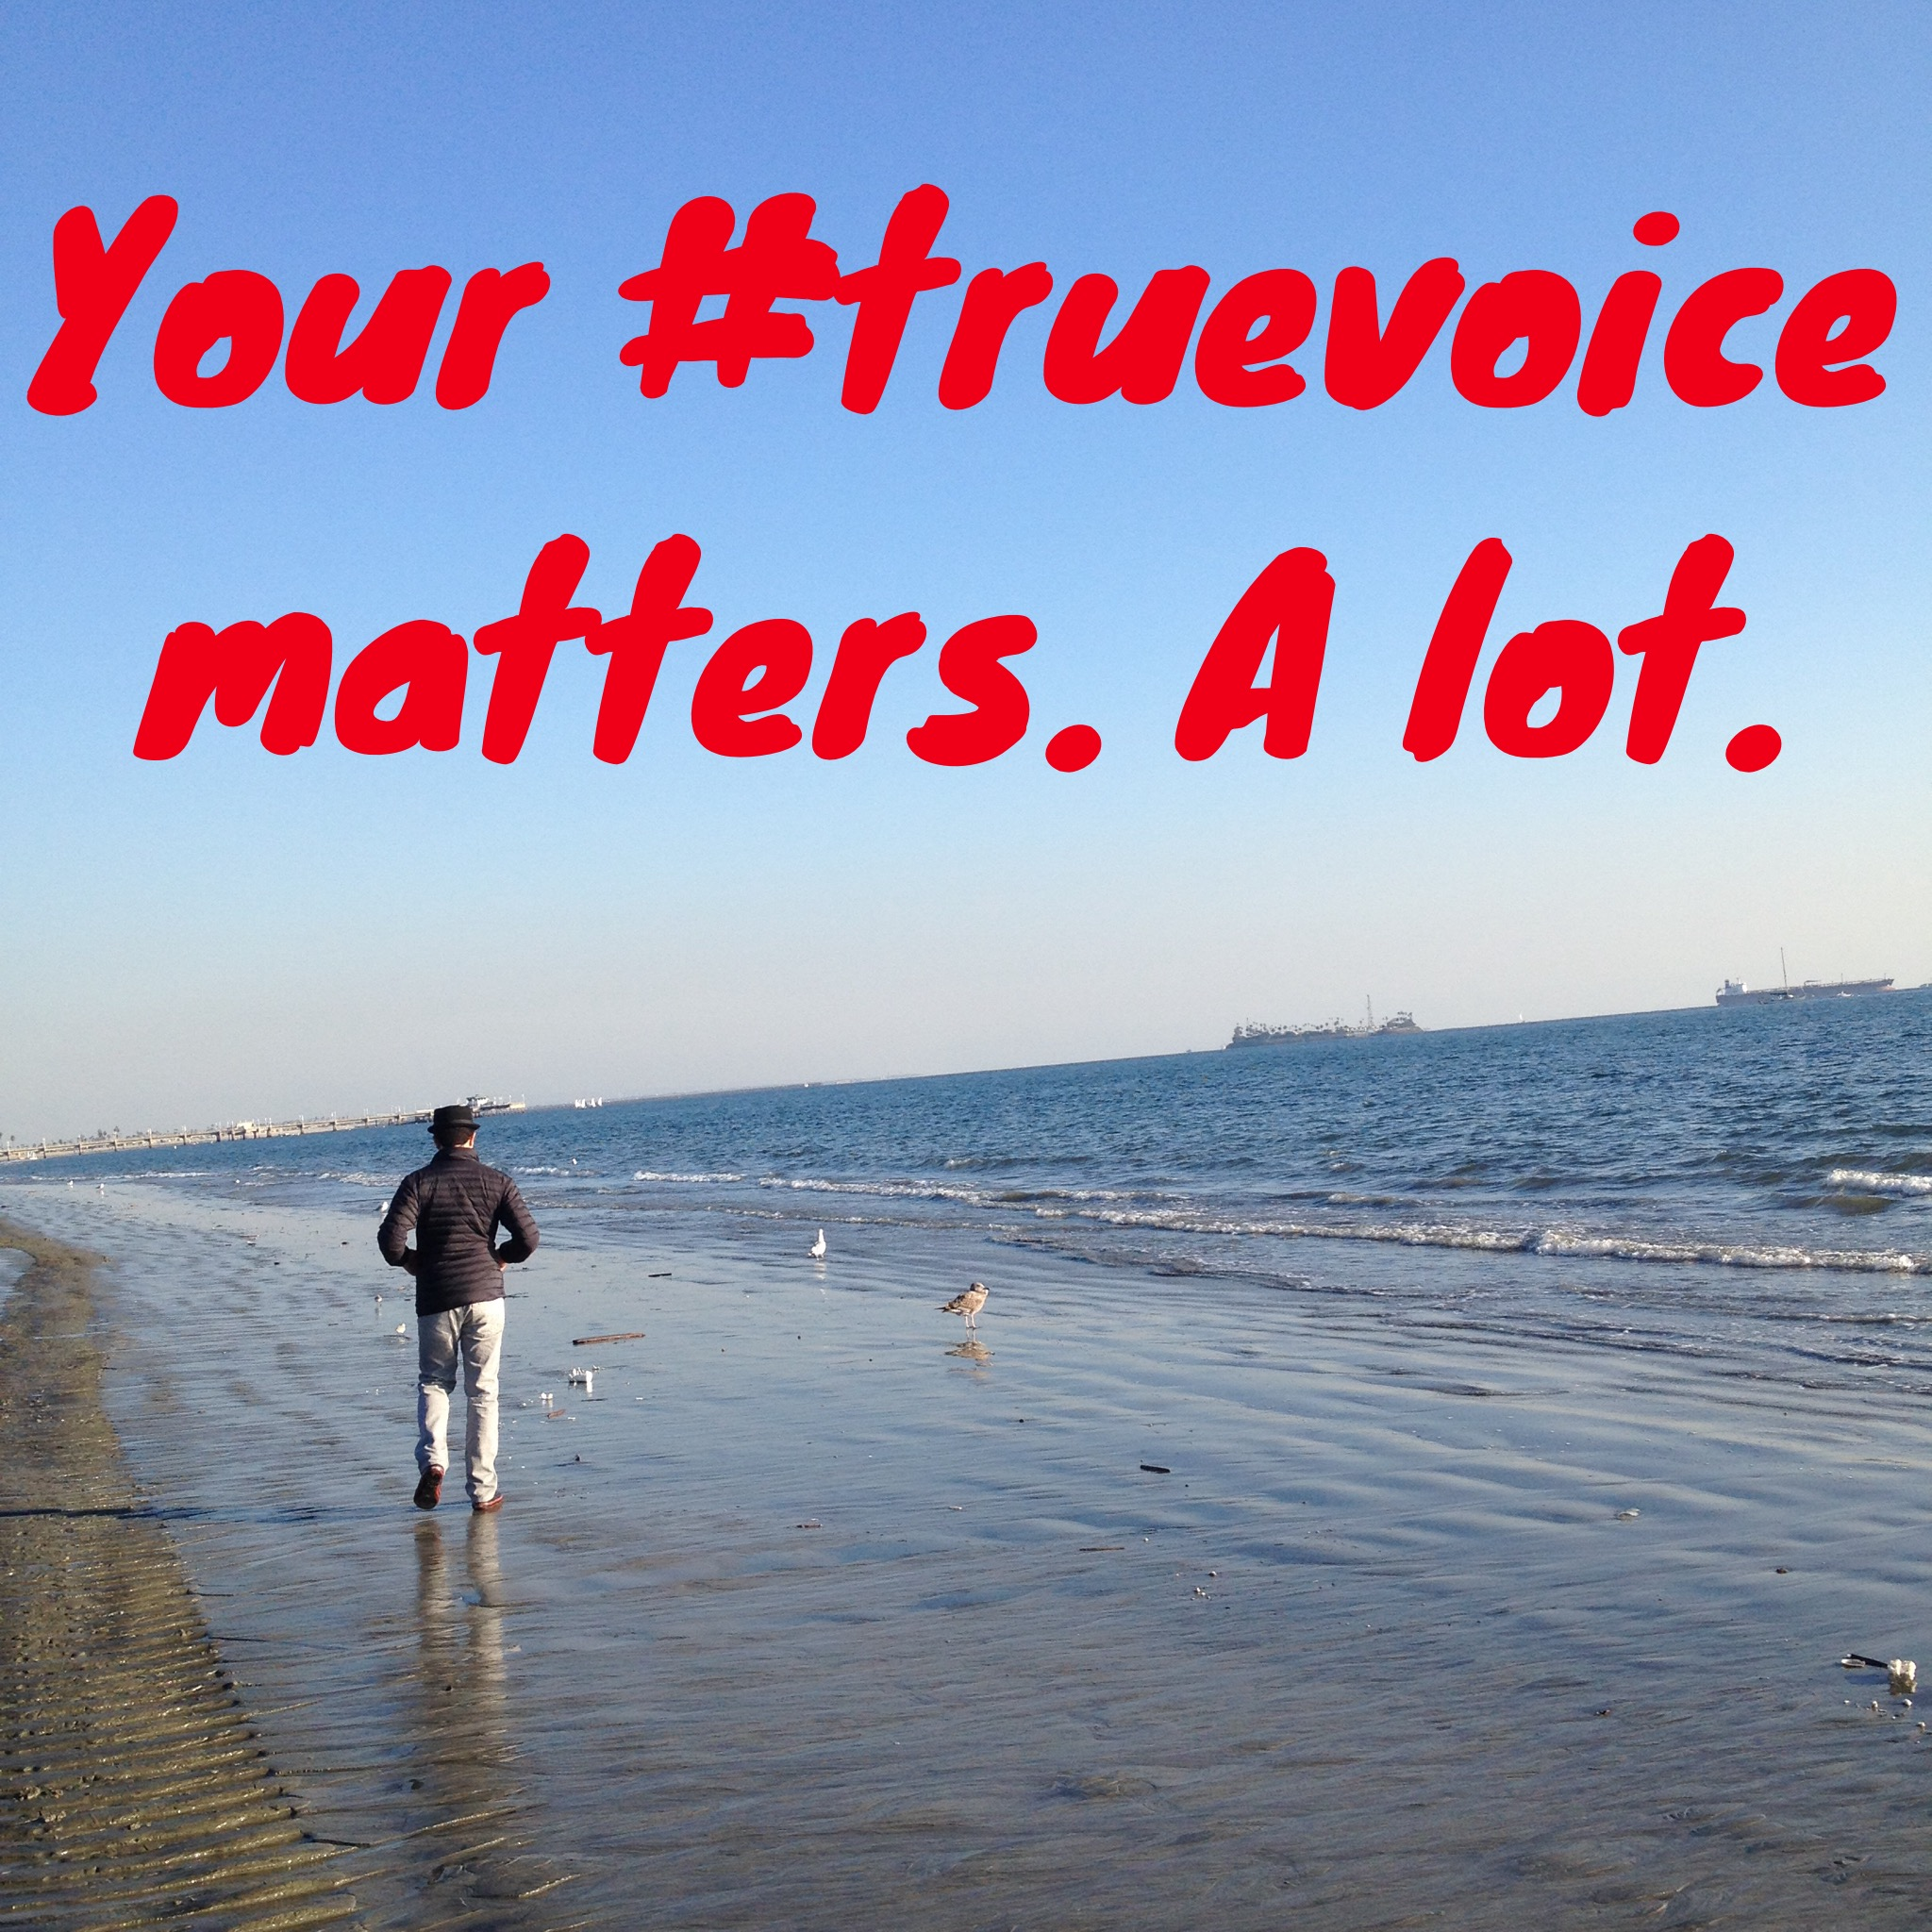 On True Voice Branding